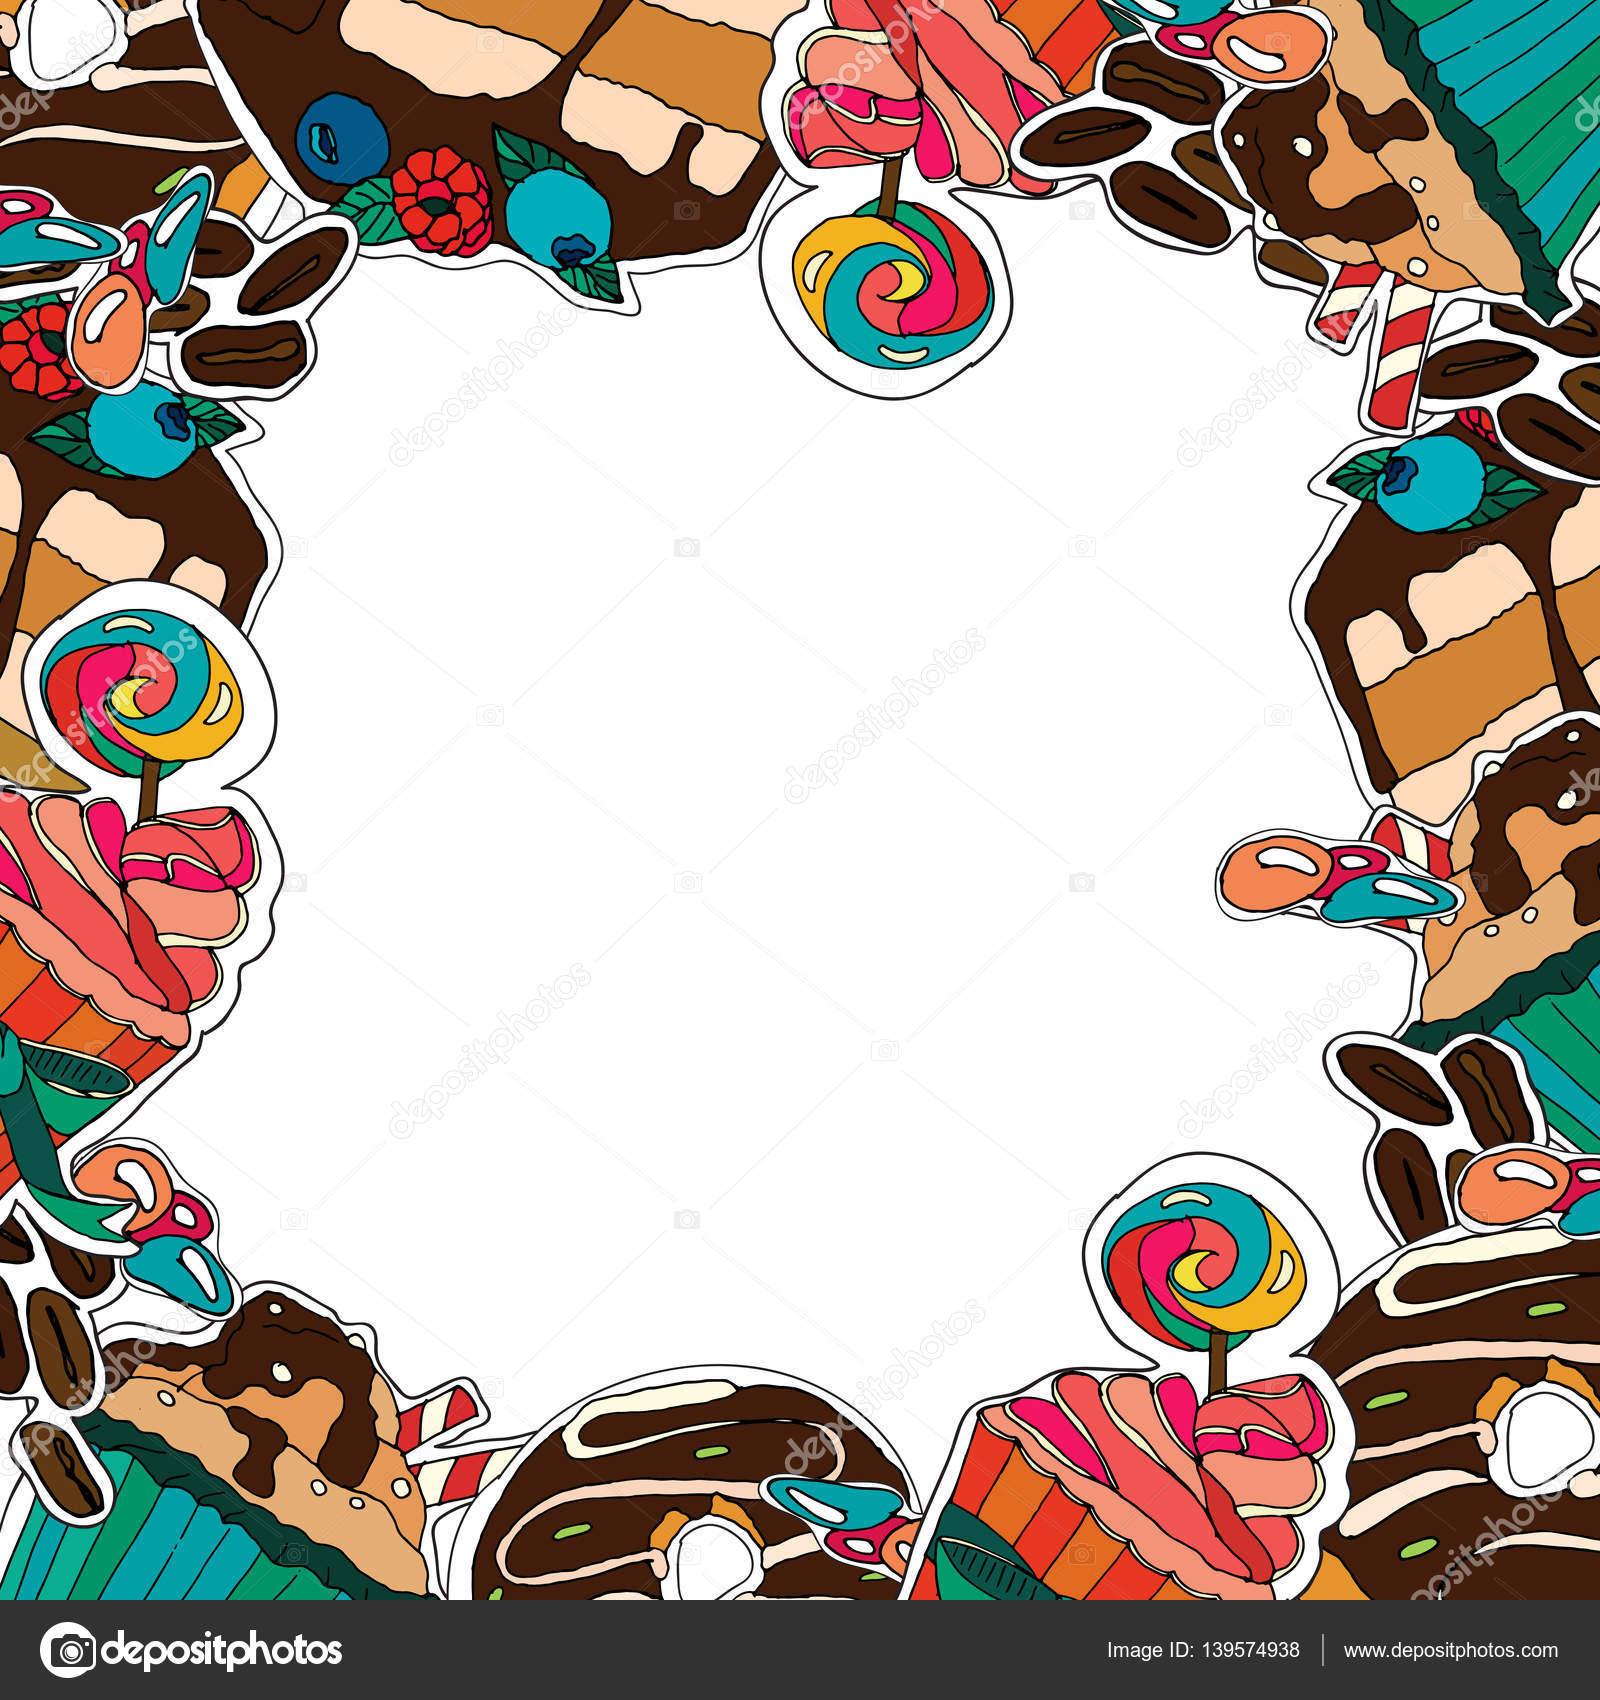 Marco de vectores postres muffins cupcakes dulces - Plantillas para reposteria ...